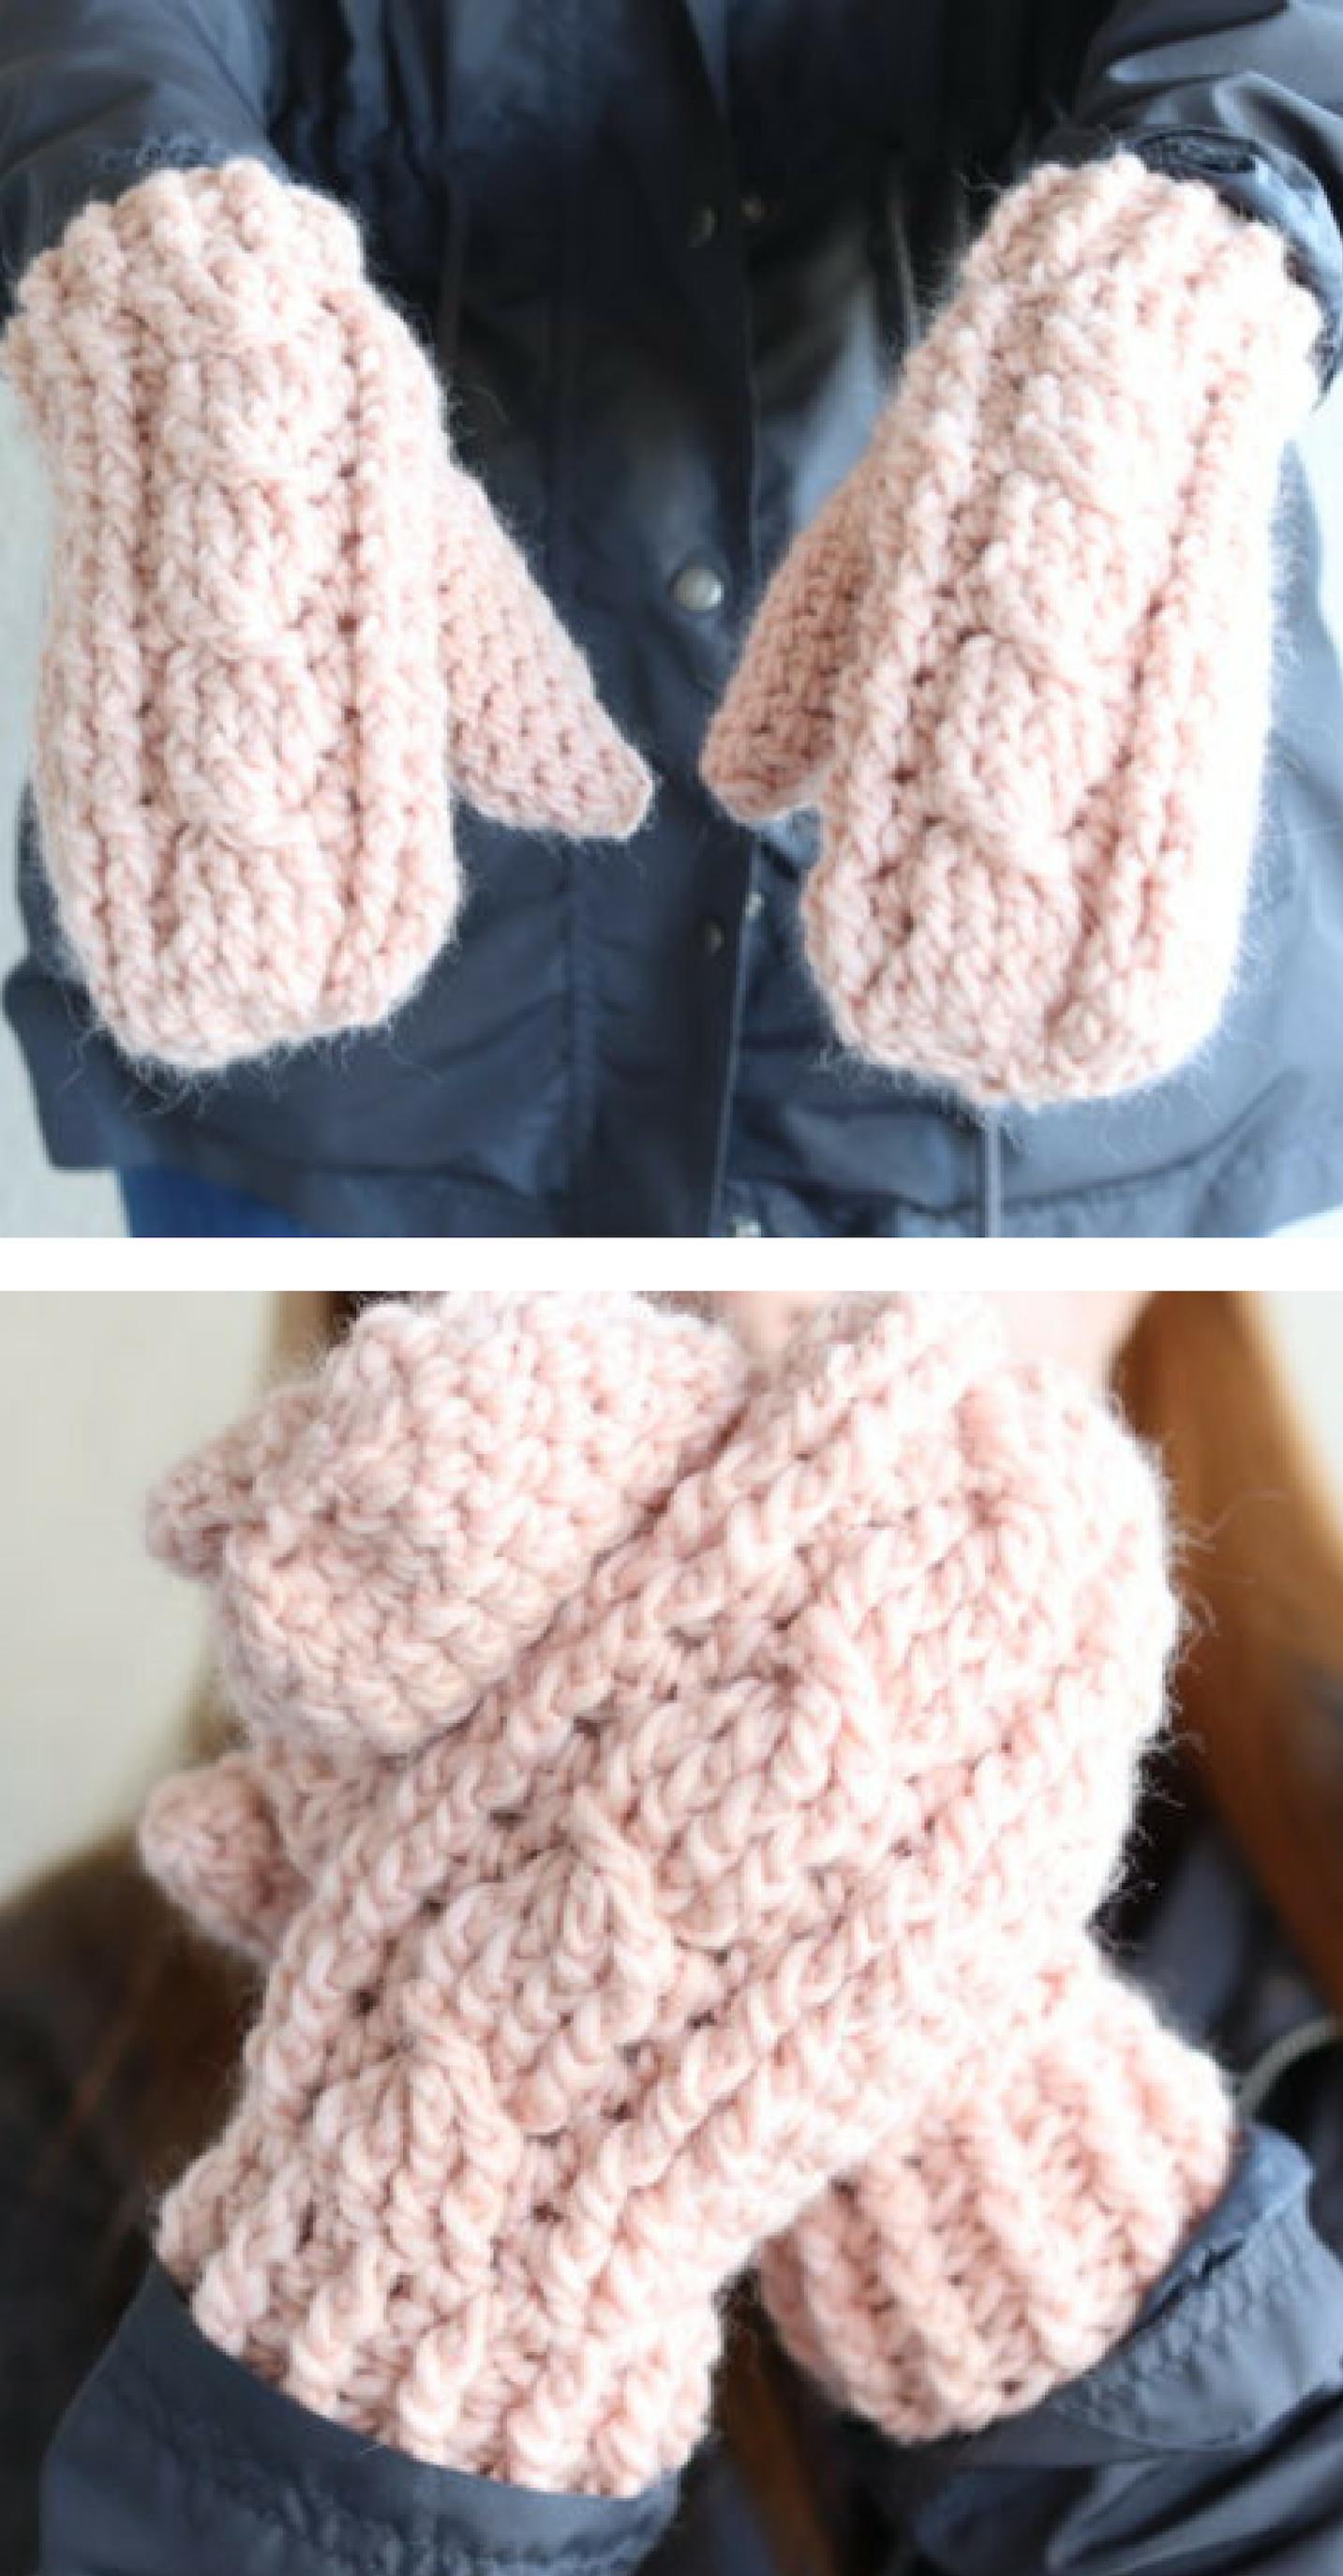 Daisy Farm Crafts Crochet Hats Free Pattern Ladies Crochet Cable Crochet Mittens